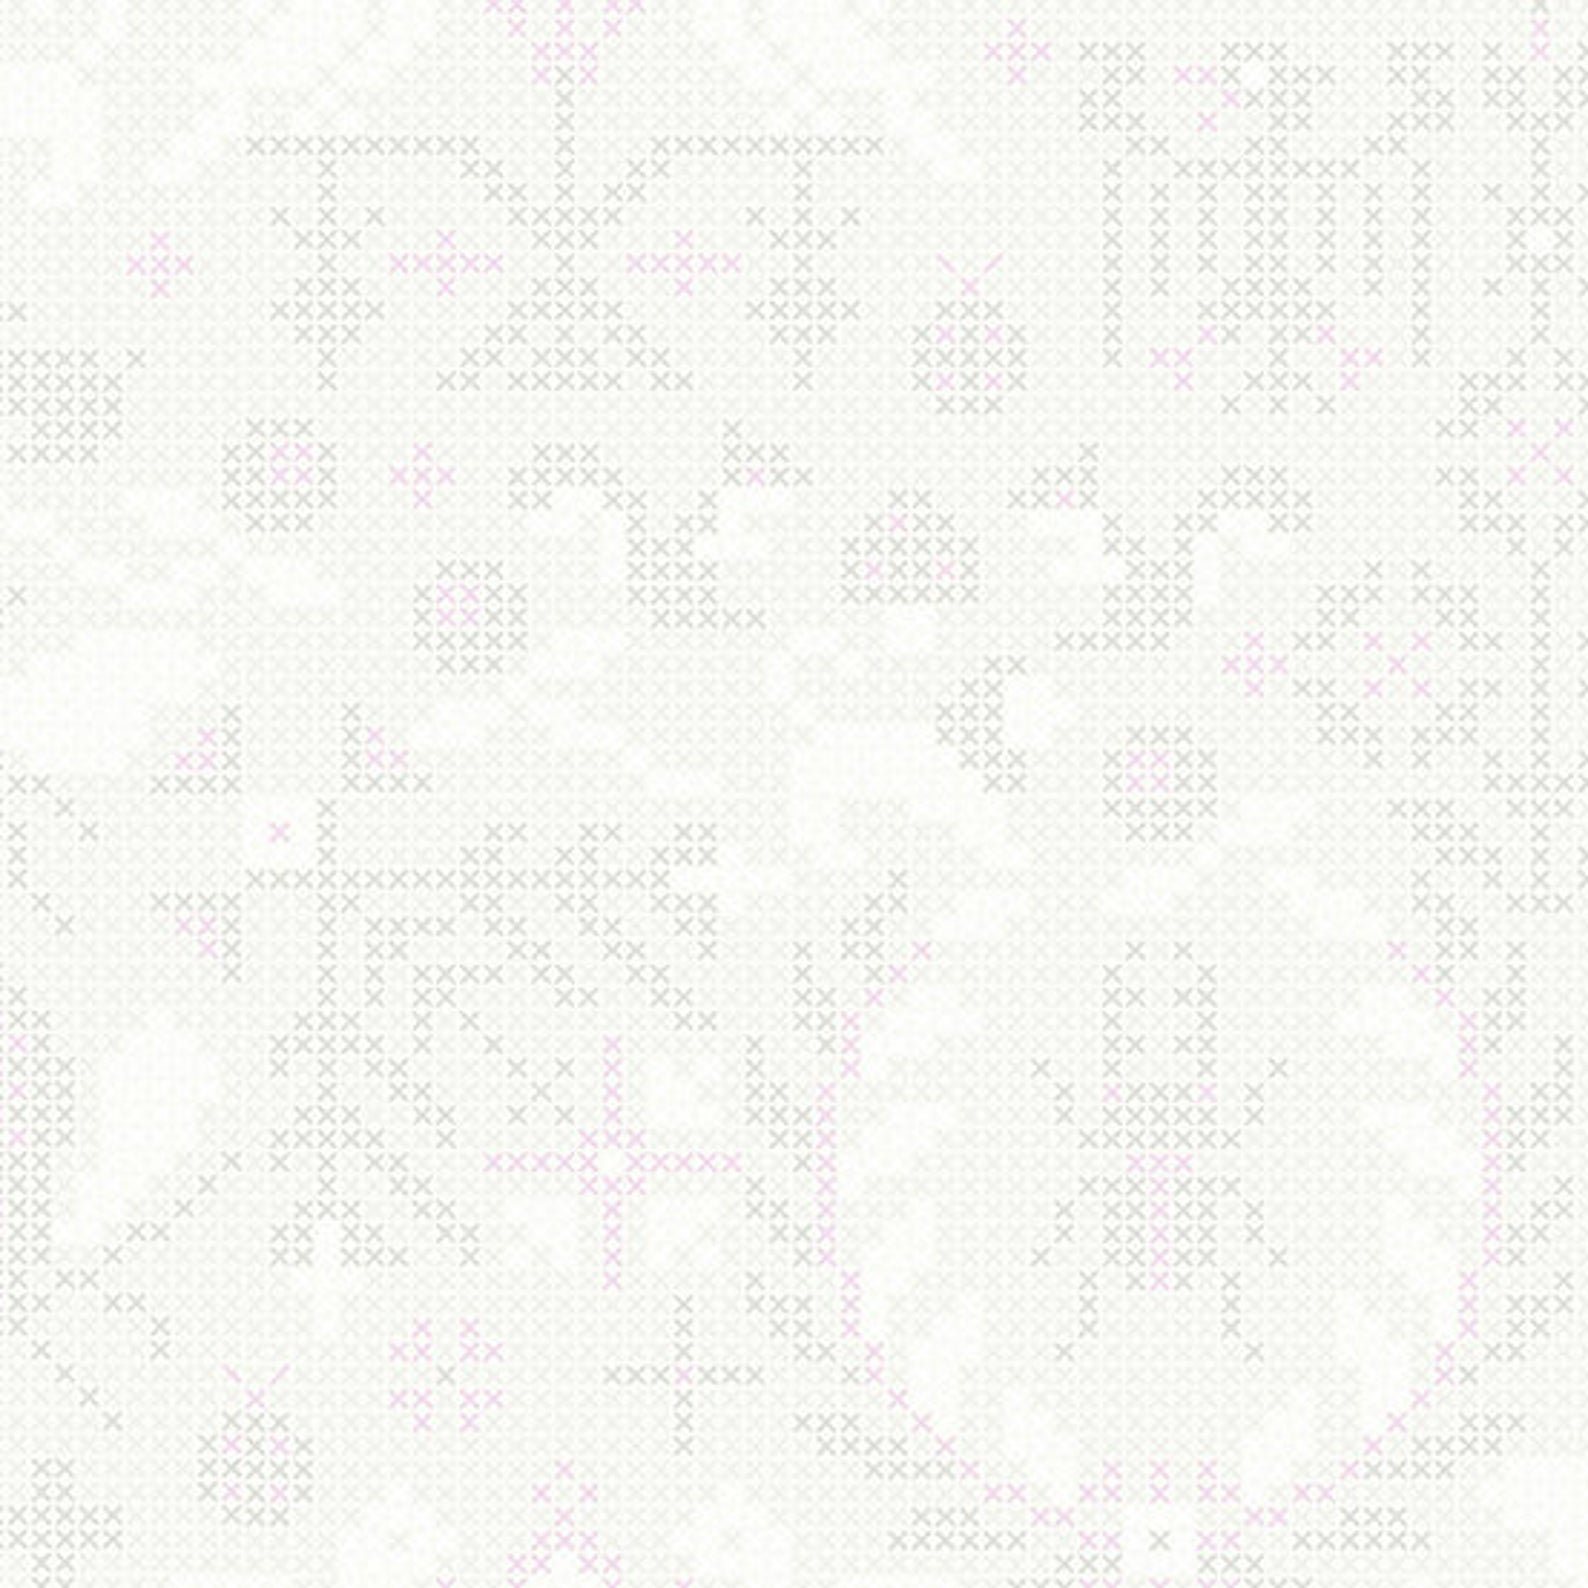 Unicorn Menagerie Sun Print 2020 by Alison Glass- Fat Quarter